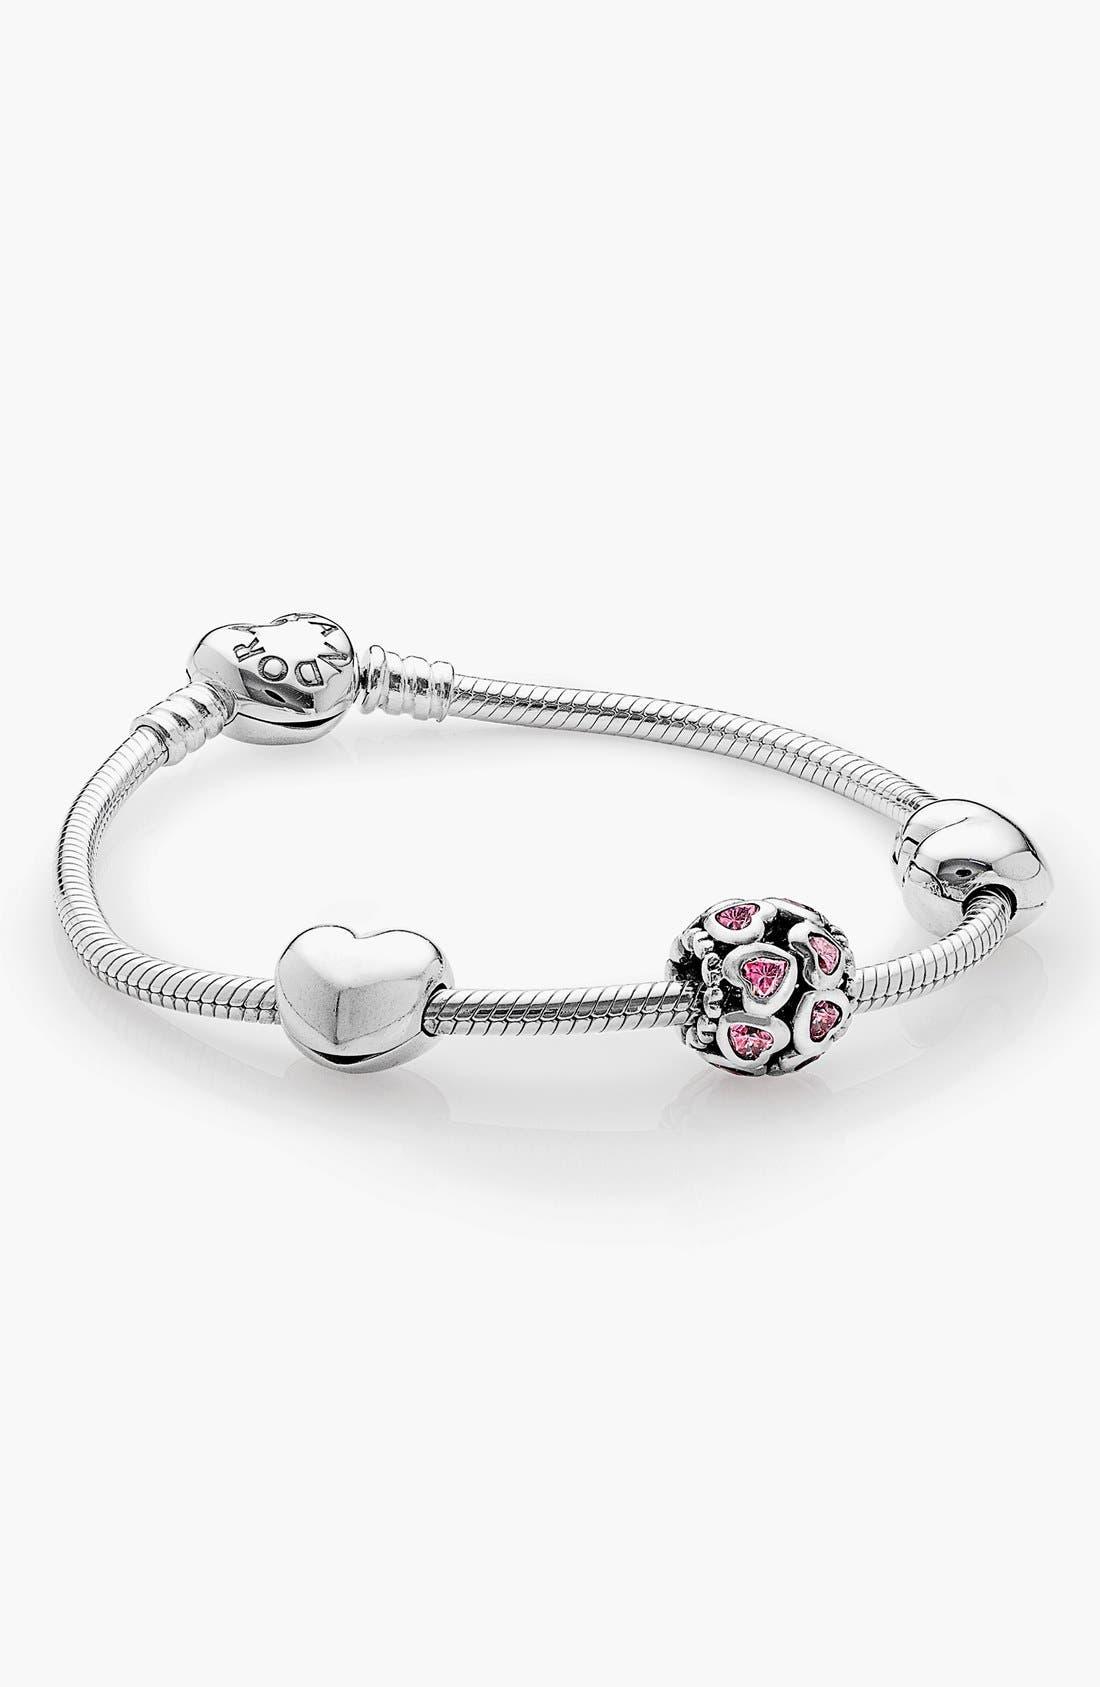 Alternate Image 1 Selected - PANDORA 'From the Heart' Boxed Charm Bracelet Set